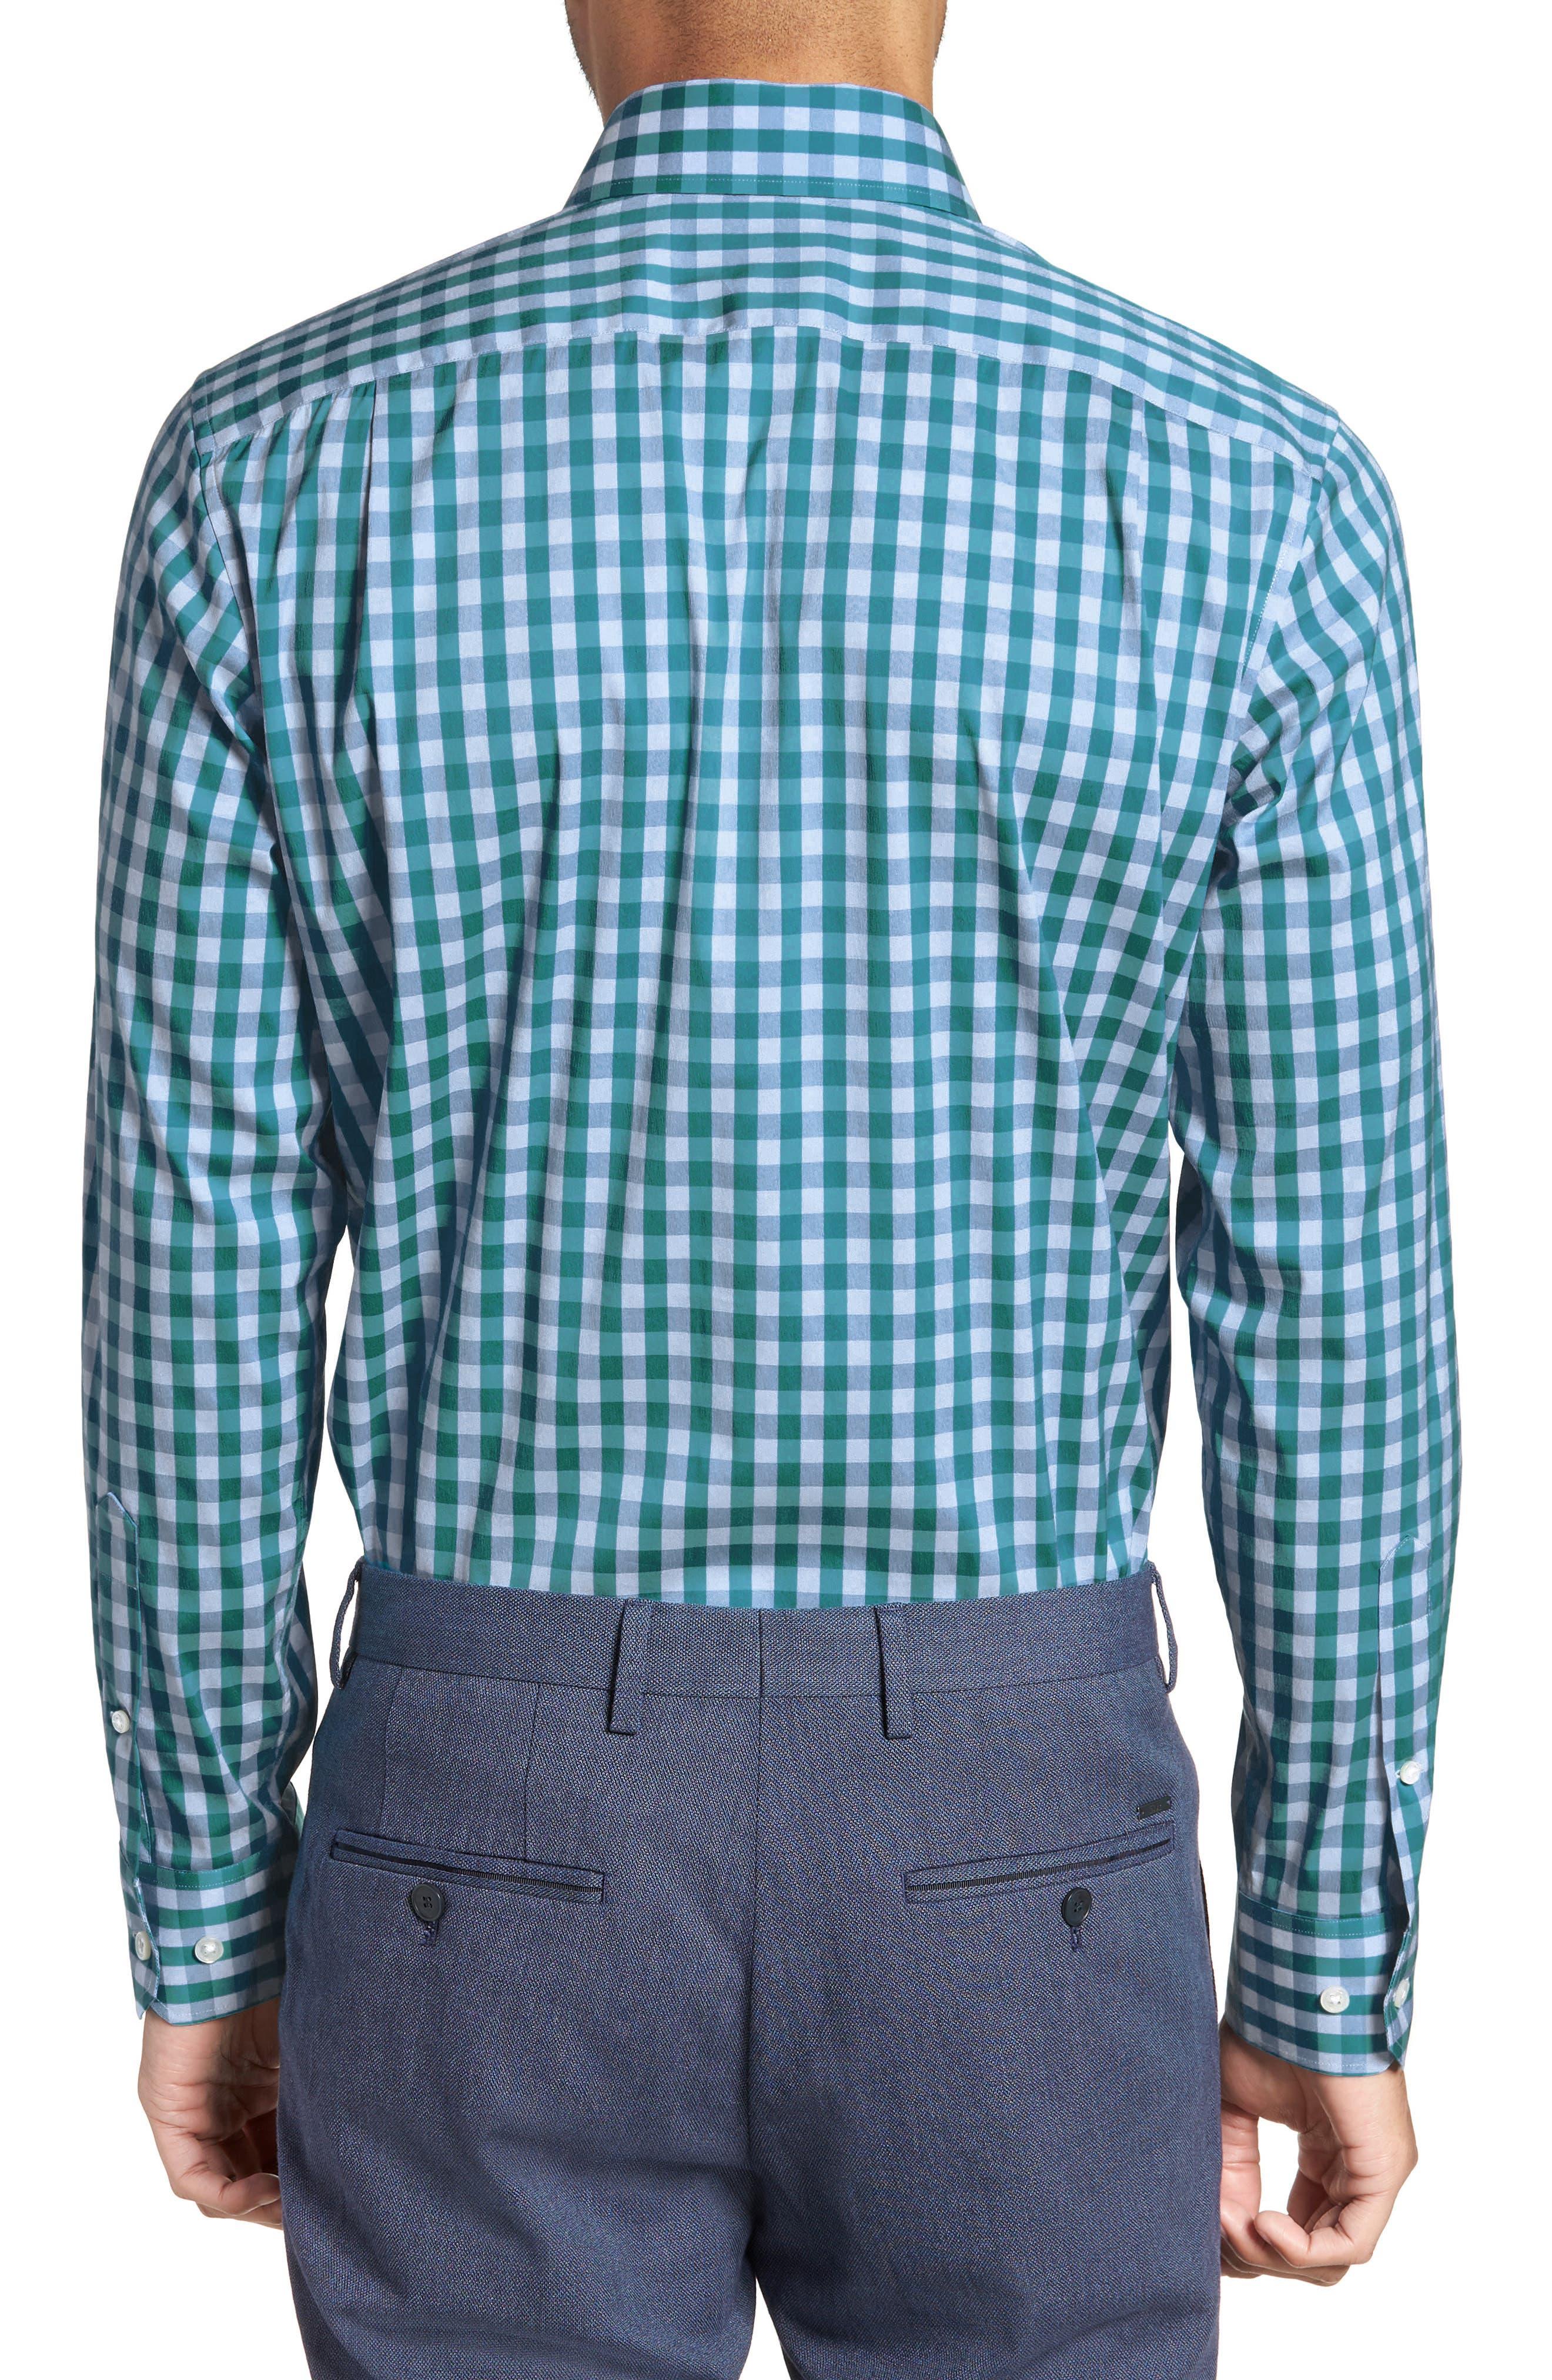 Port Grand Slim Fit Stretch Check Dress Shirt,                             Alternate thumbnail 3, color,                             TEAL